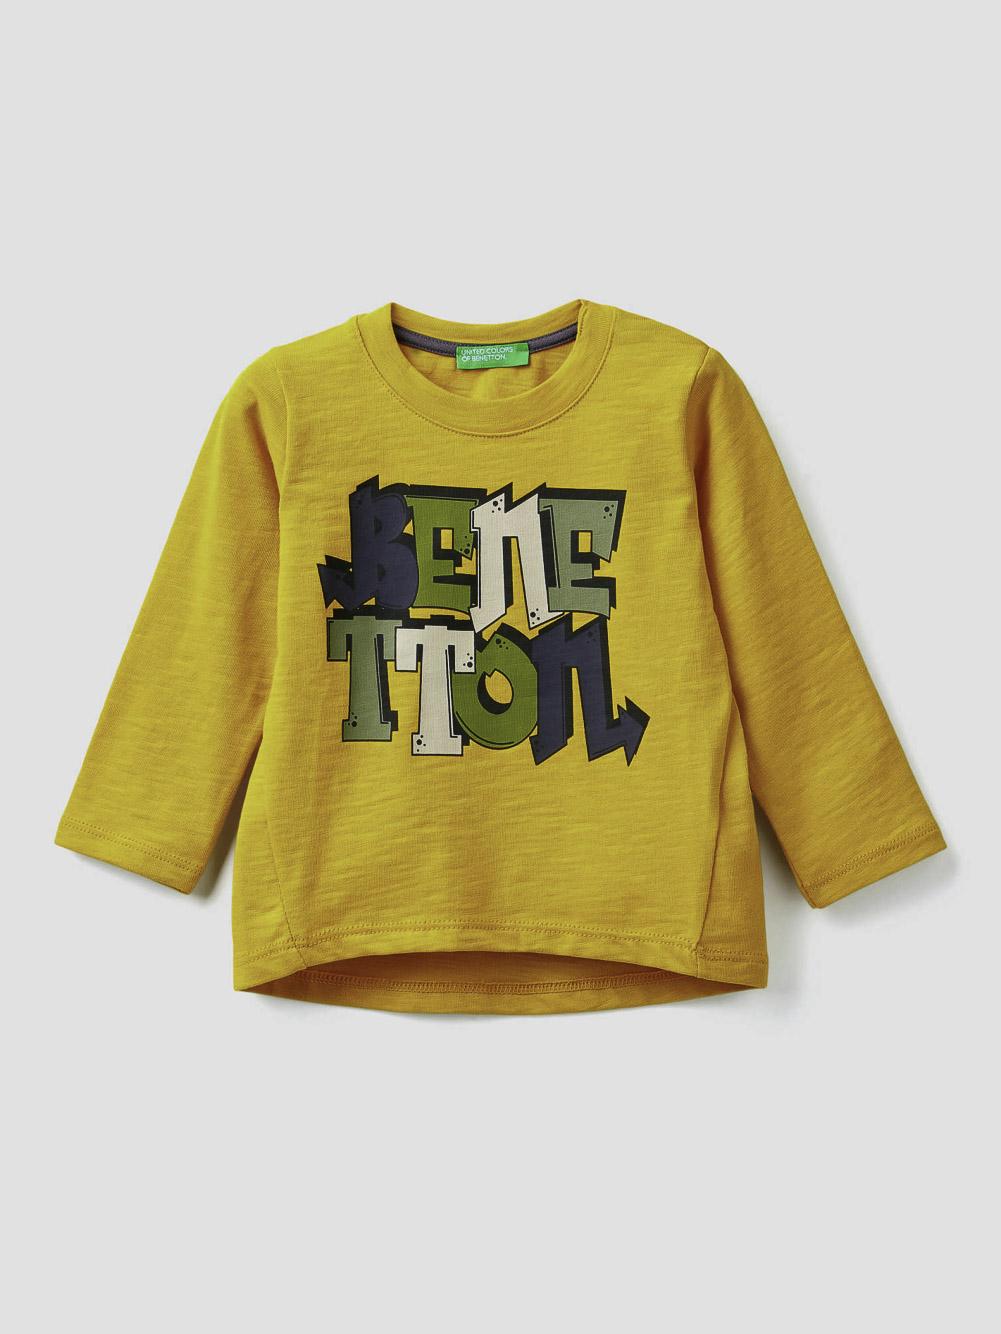 012 BENETTON T-shirt από οργανικό βαμβάκι 3F42C14SI 20A29U